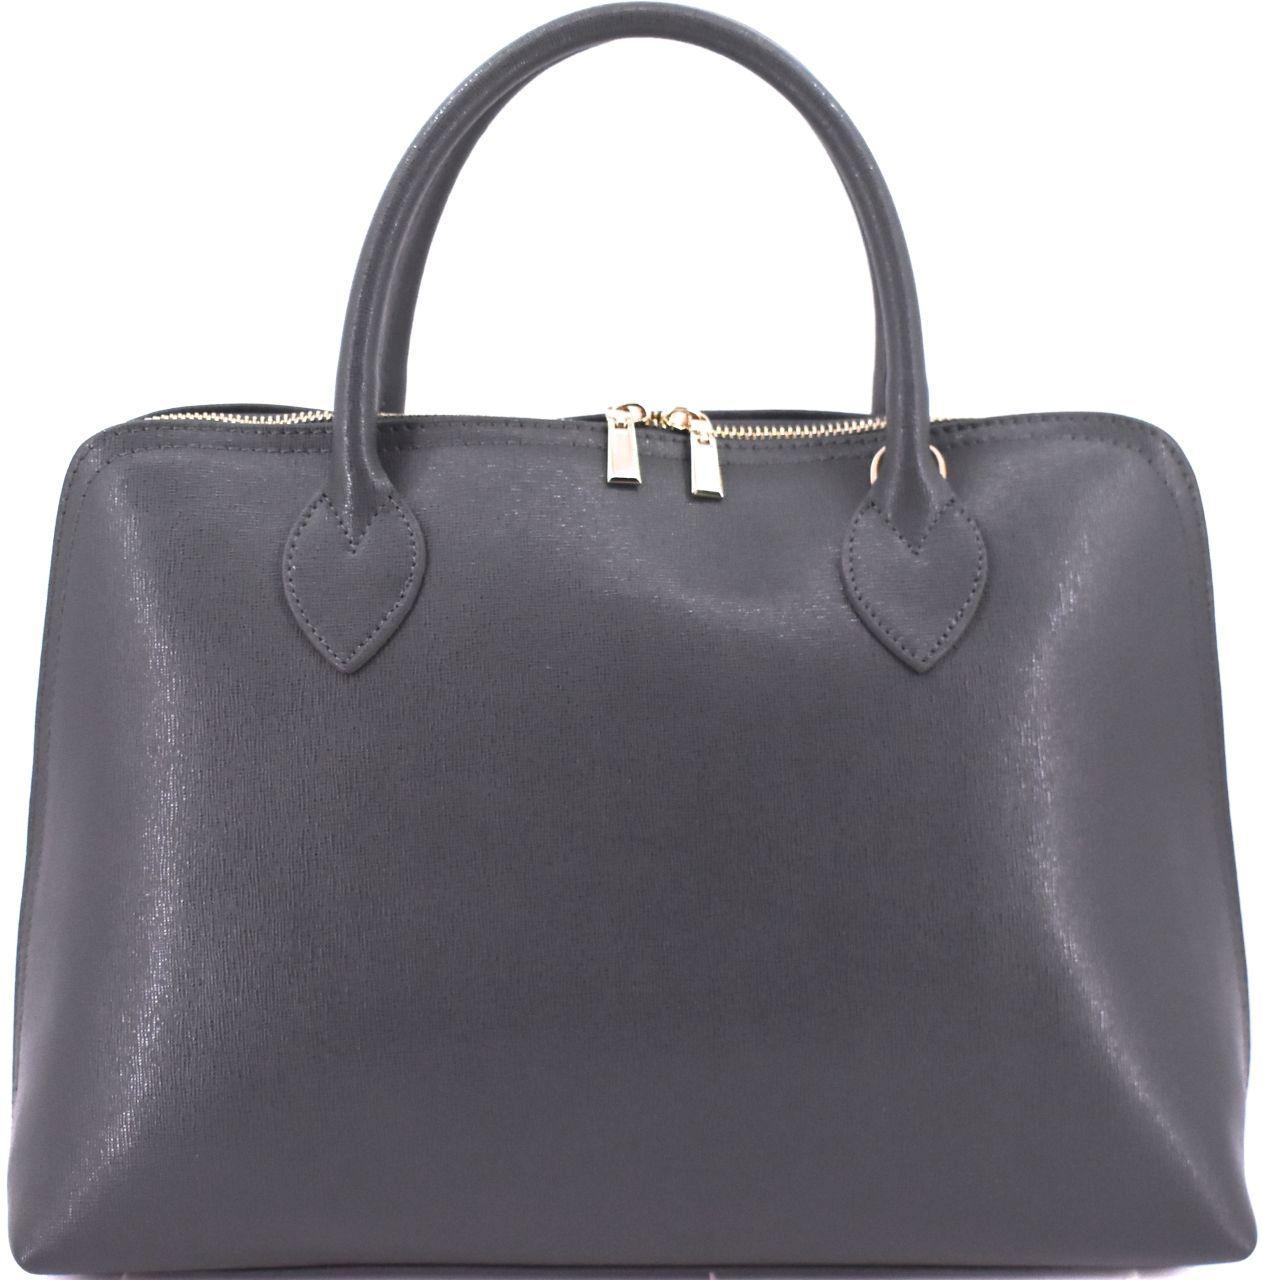 Dámská kožená kabelka Arteddy-tmavě šedá 32445